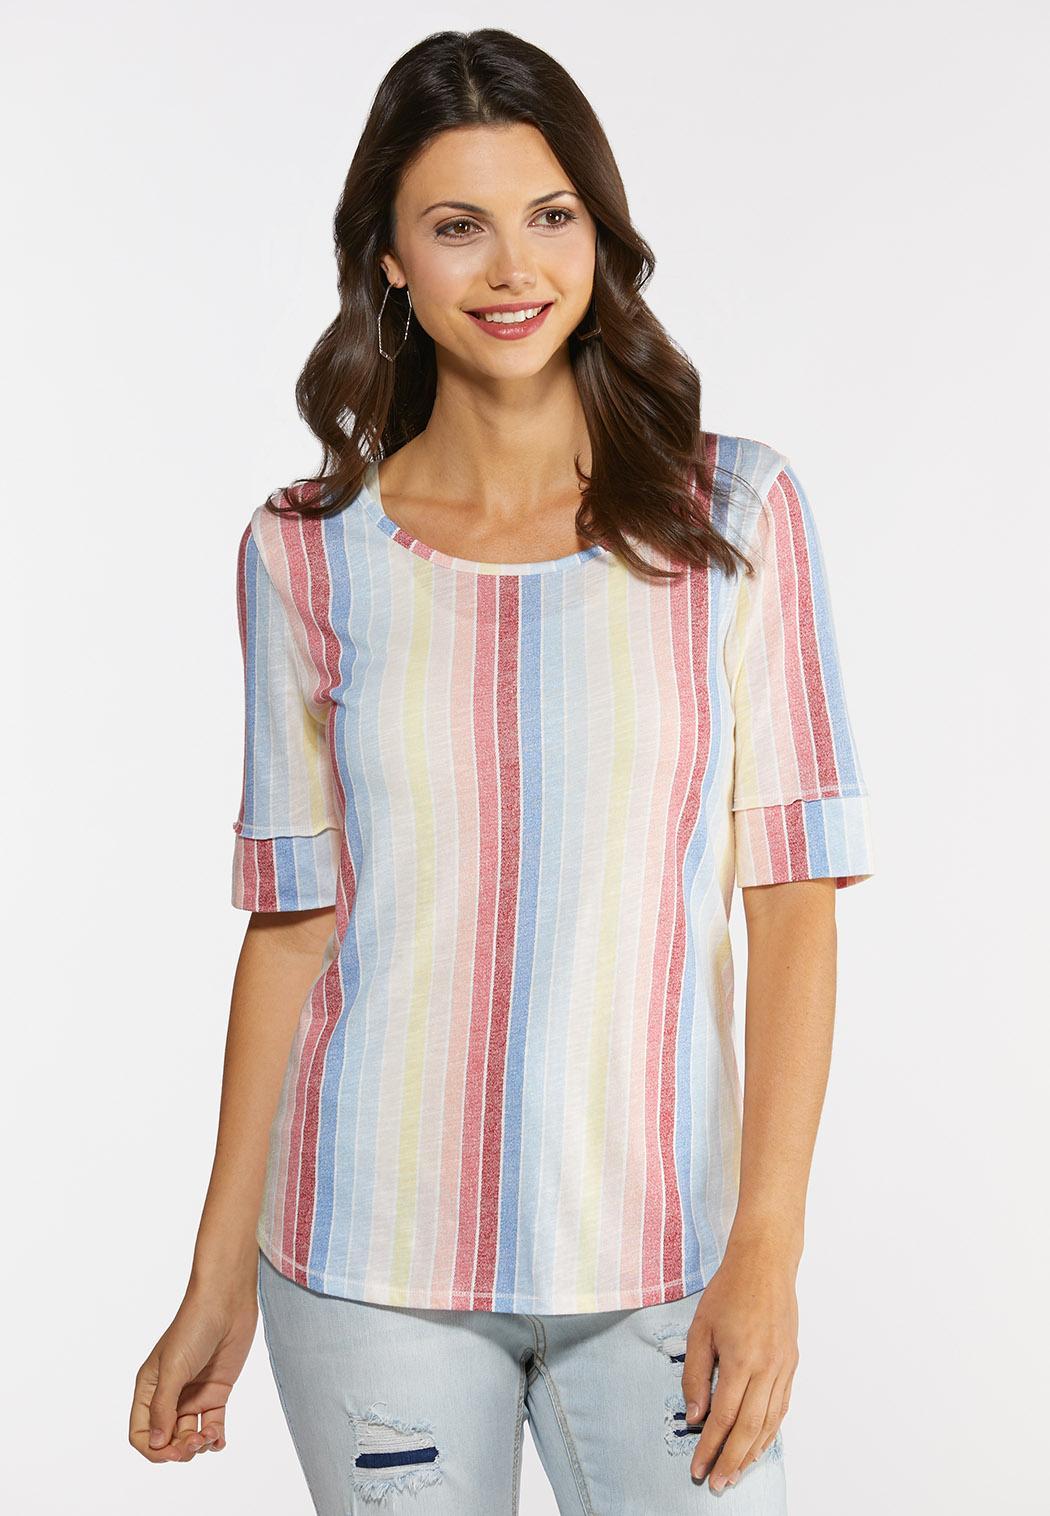 Muted Rainbow Stripe Top